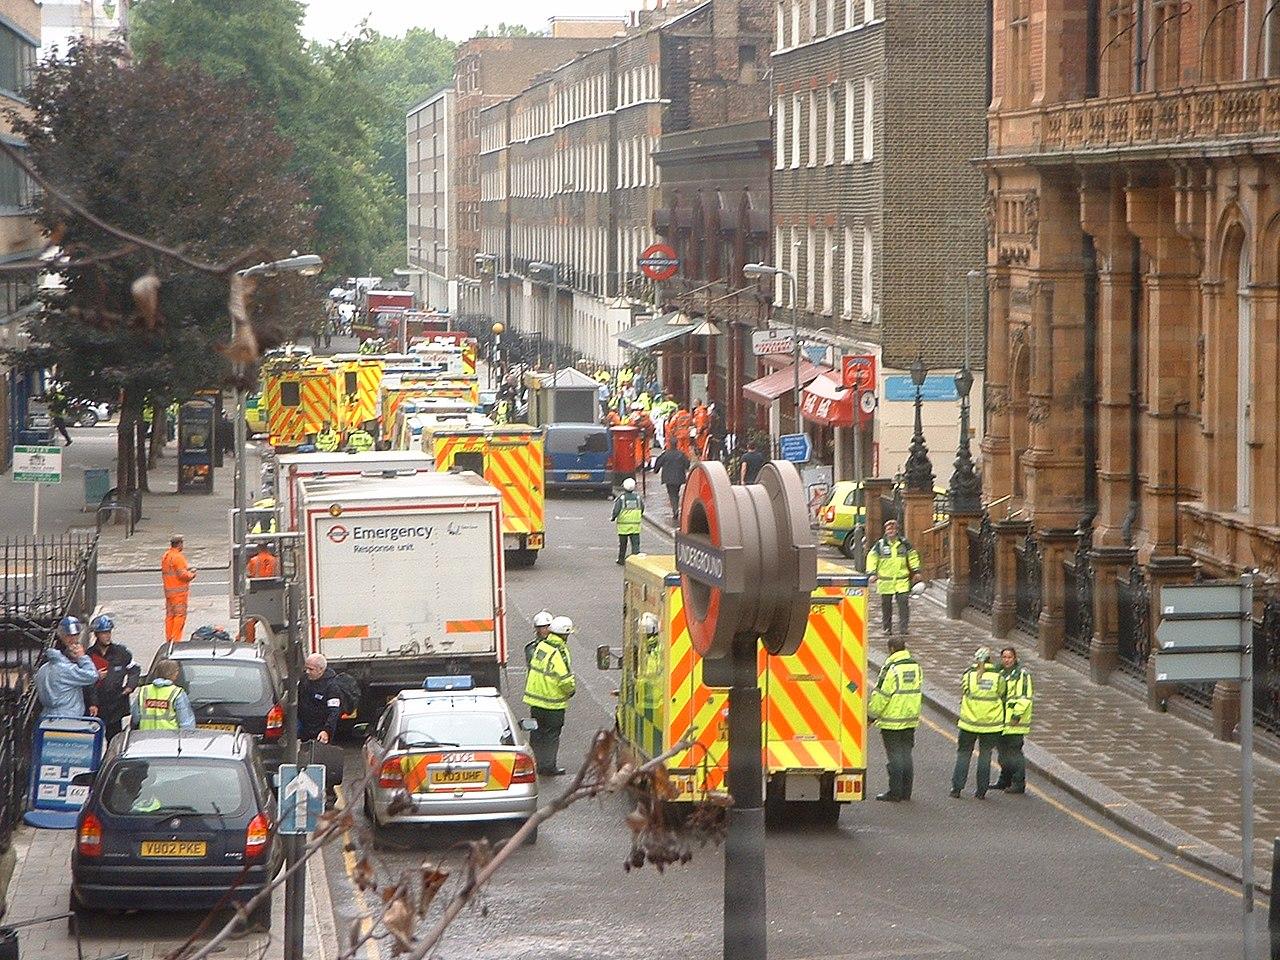 Russell square ambulances.jpg